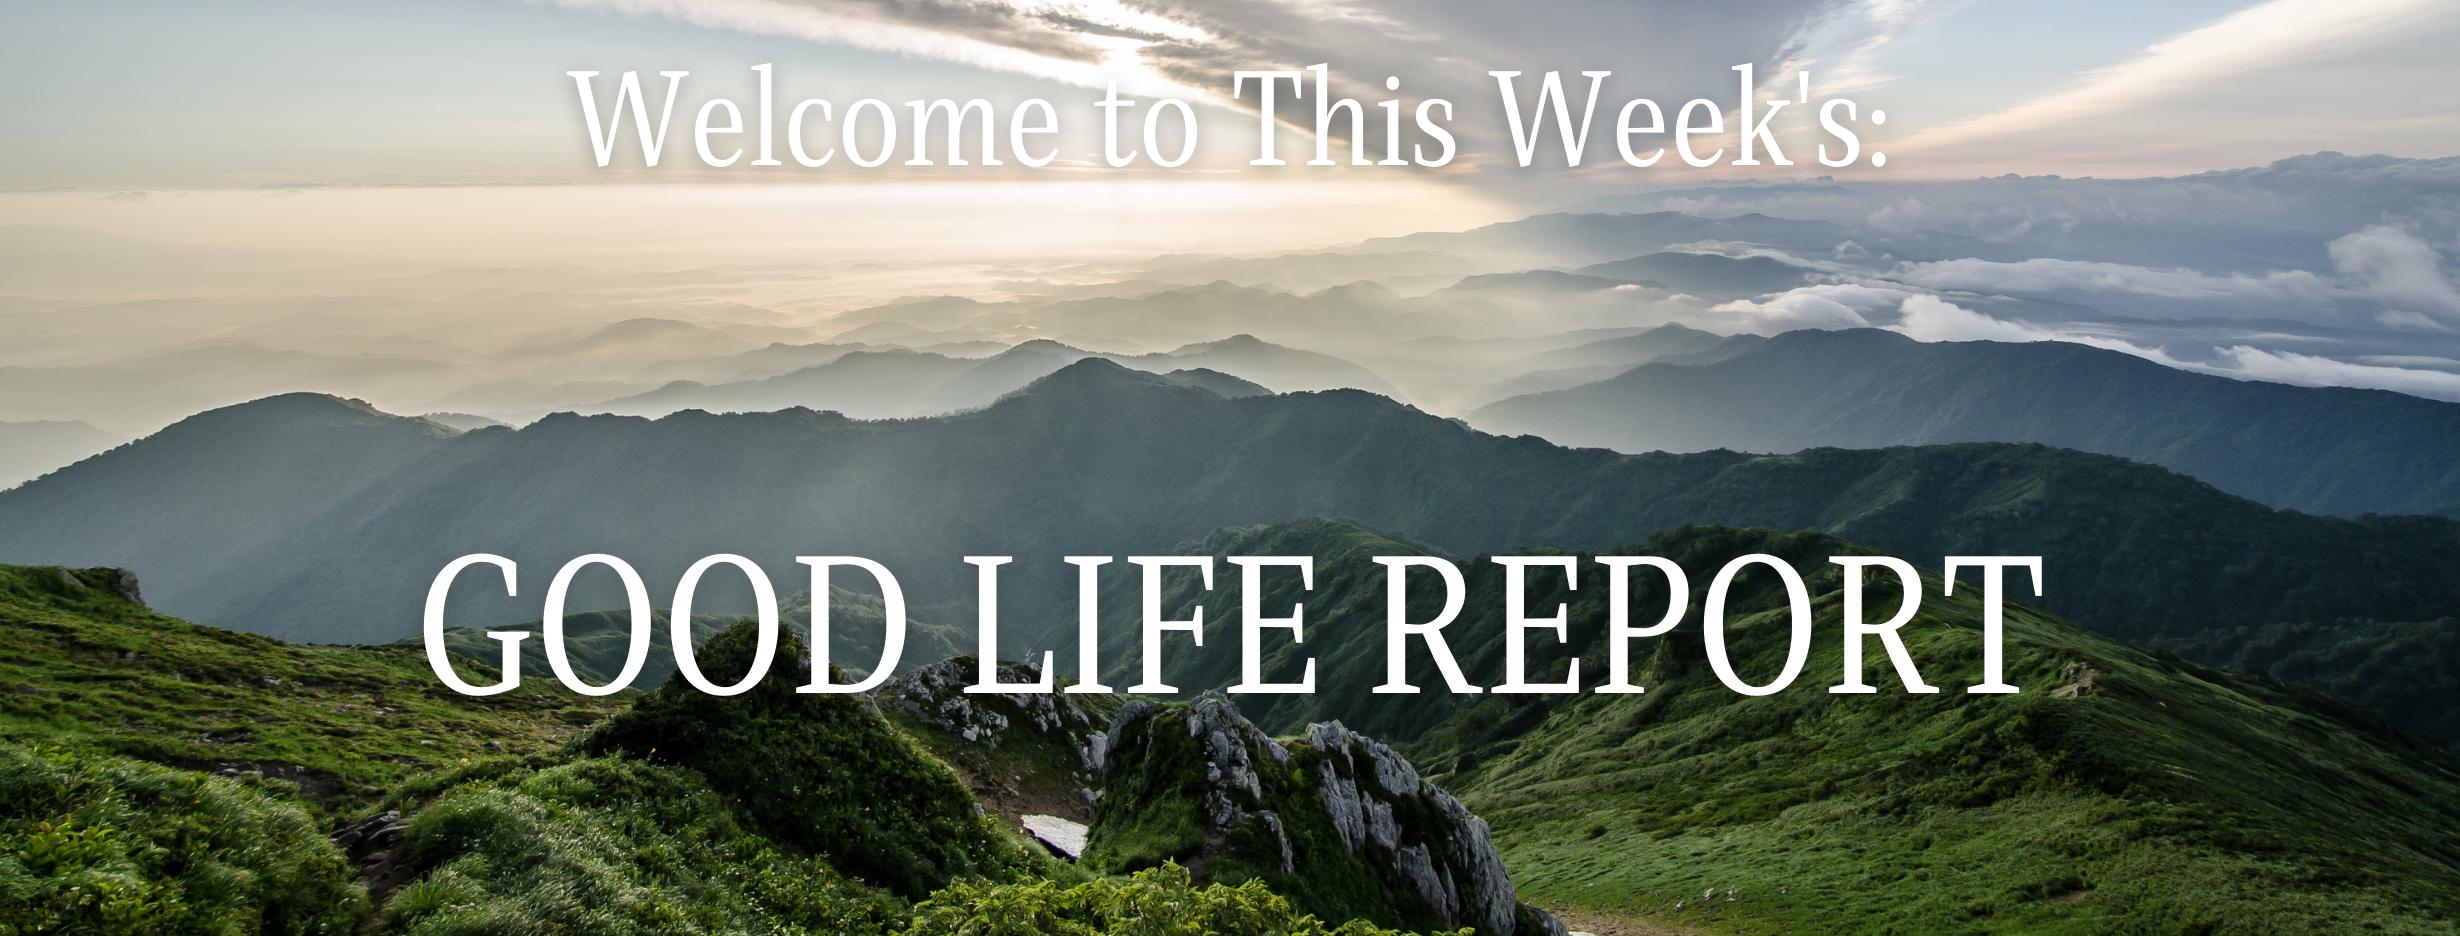 The Good Life Report - Capital Gains & Benefits of Yoga Thumbnail